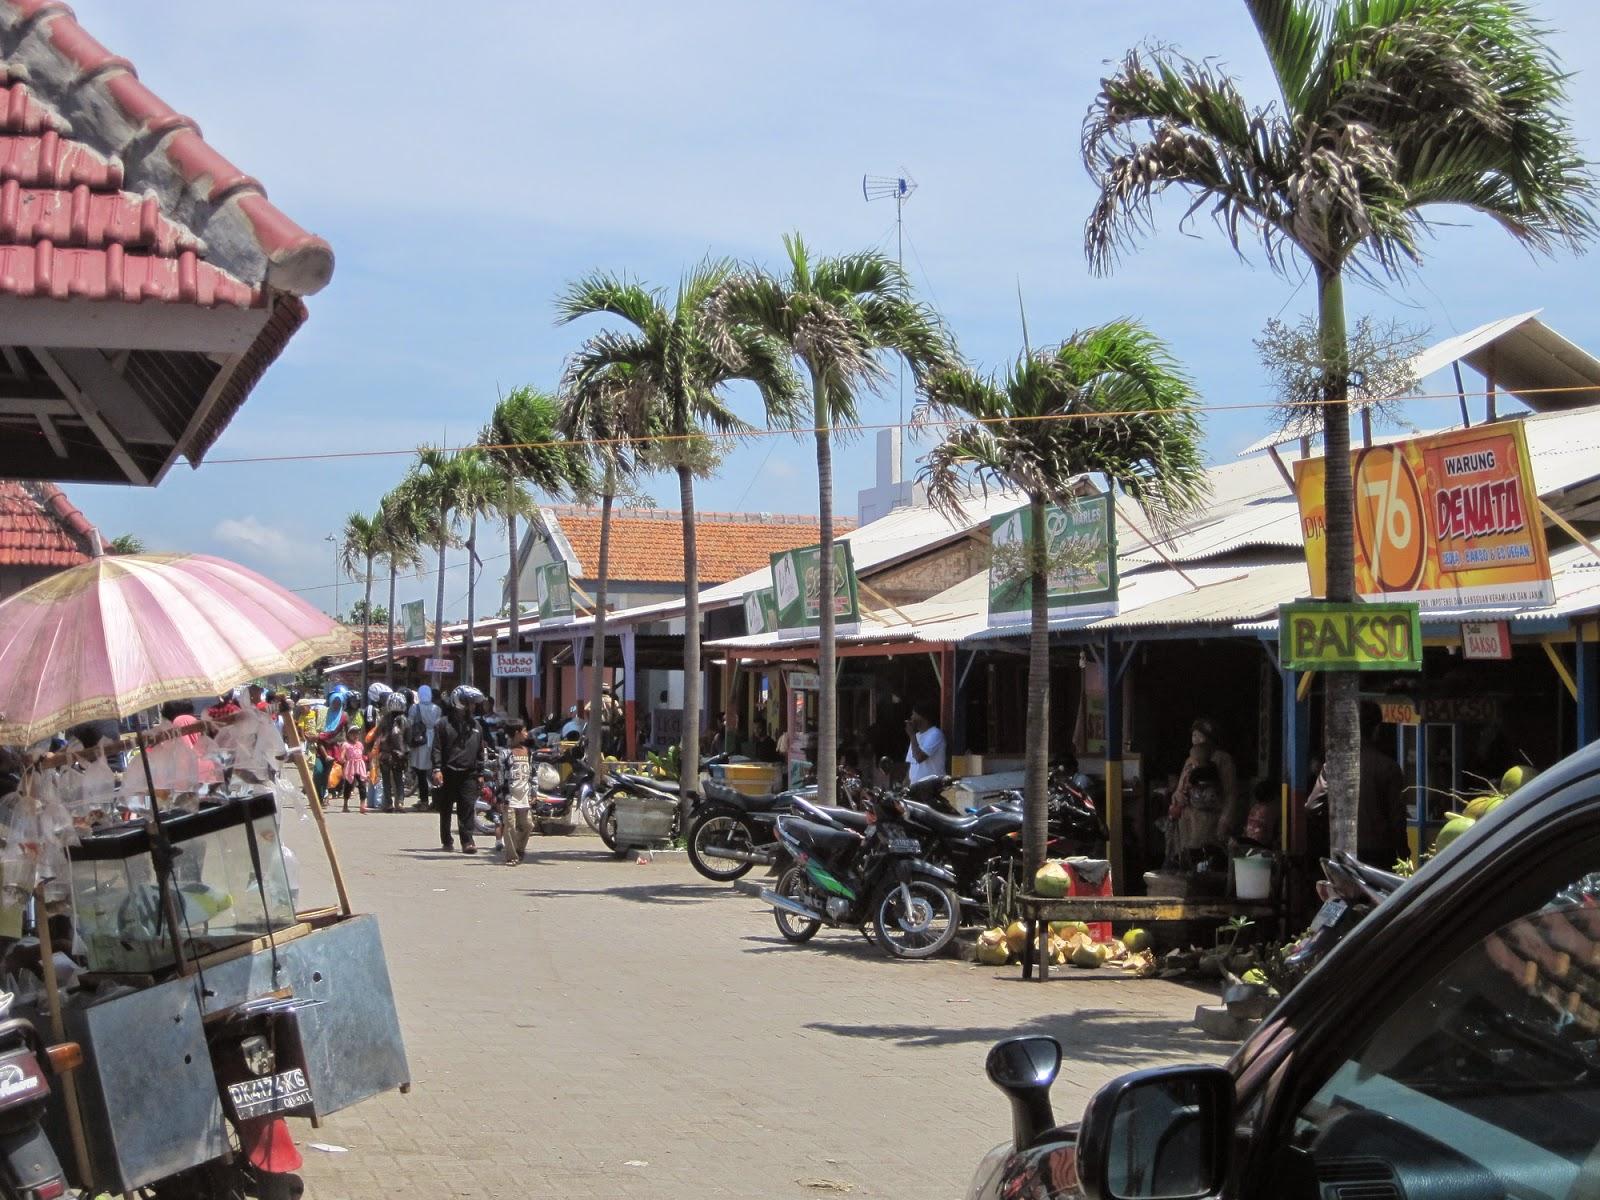 65 Tempat Wisata Banyuwangi Terkenal Menarik Dikunjungi Pantai Palu Kuning